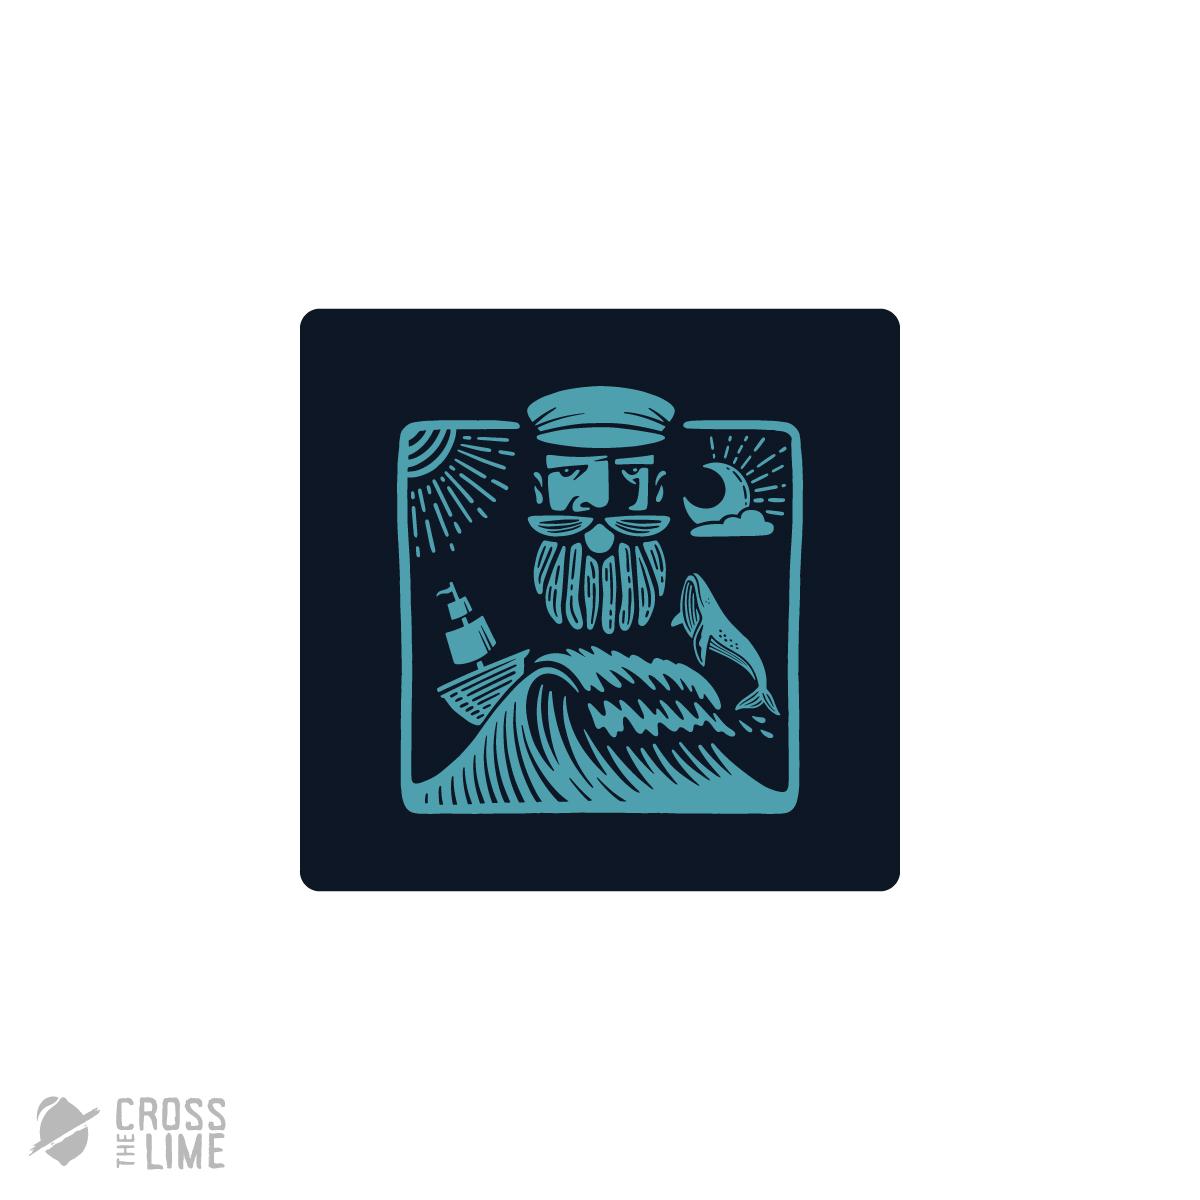 Sailor stamp logo